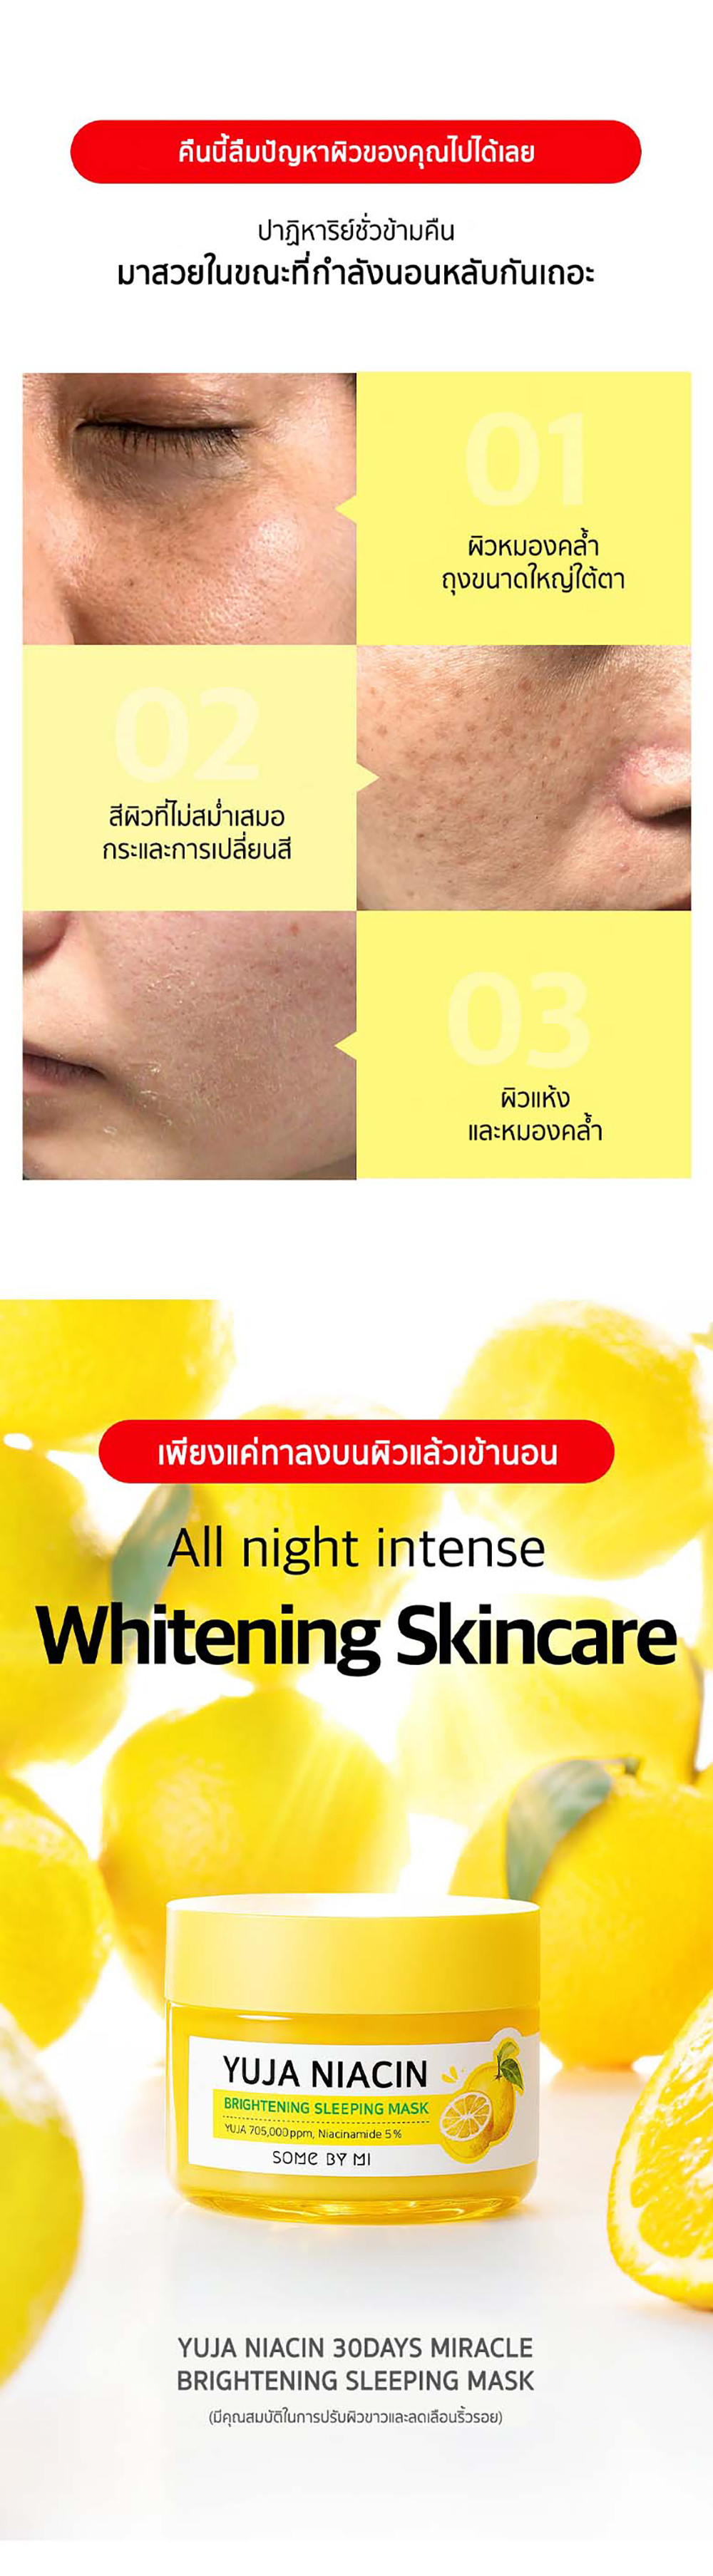 13---sbm-yuja-slp-mask-2_01.jpg